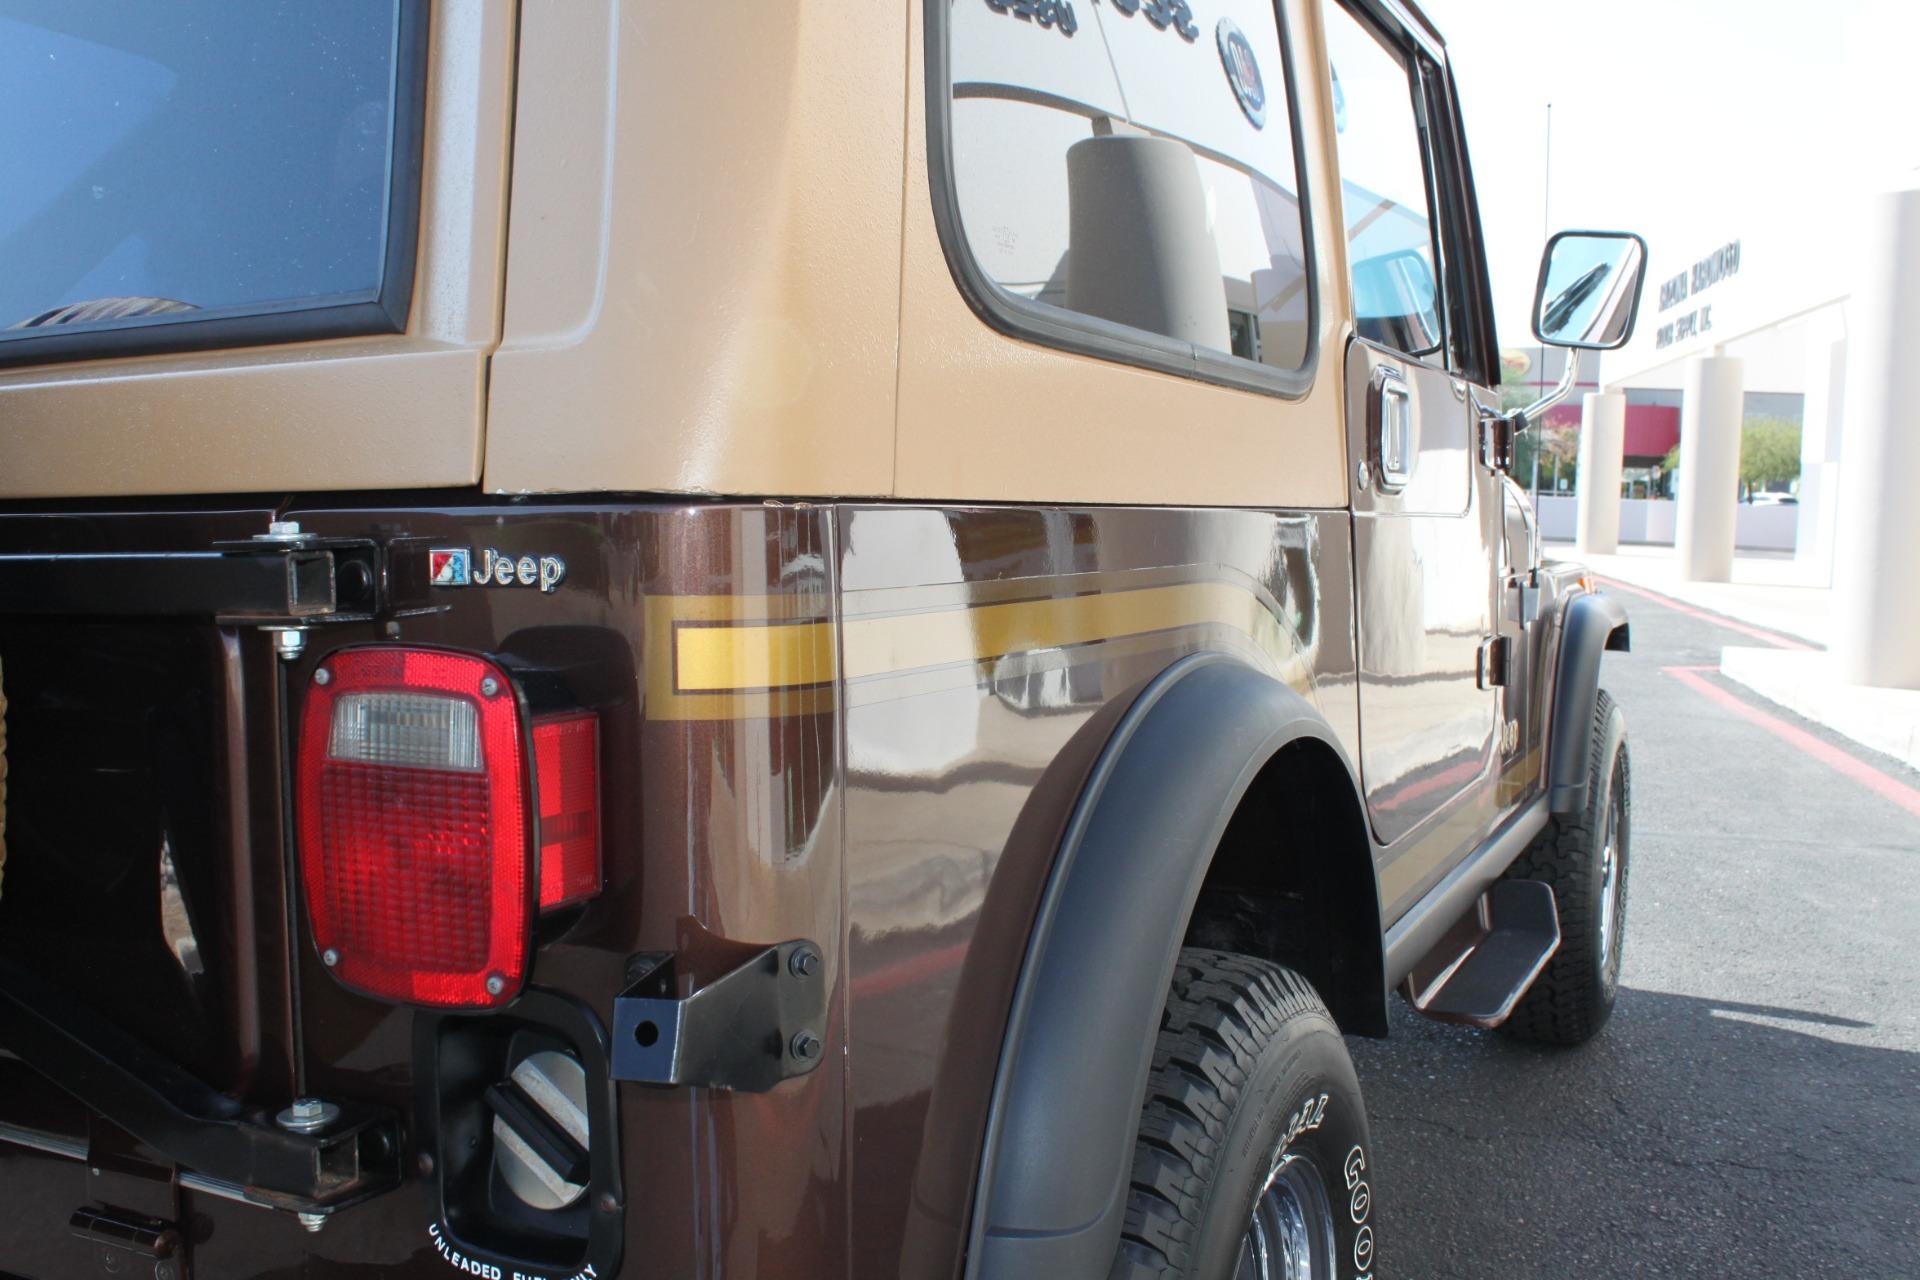 Used-1985-Jeep-CJ-7-Laredo-4WD-Chevrolet